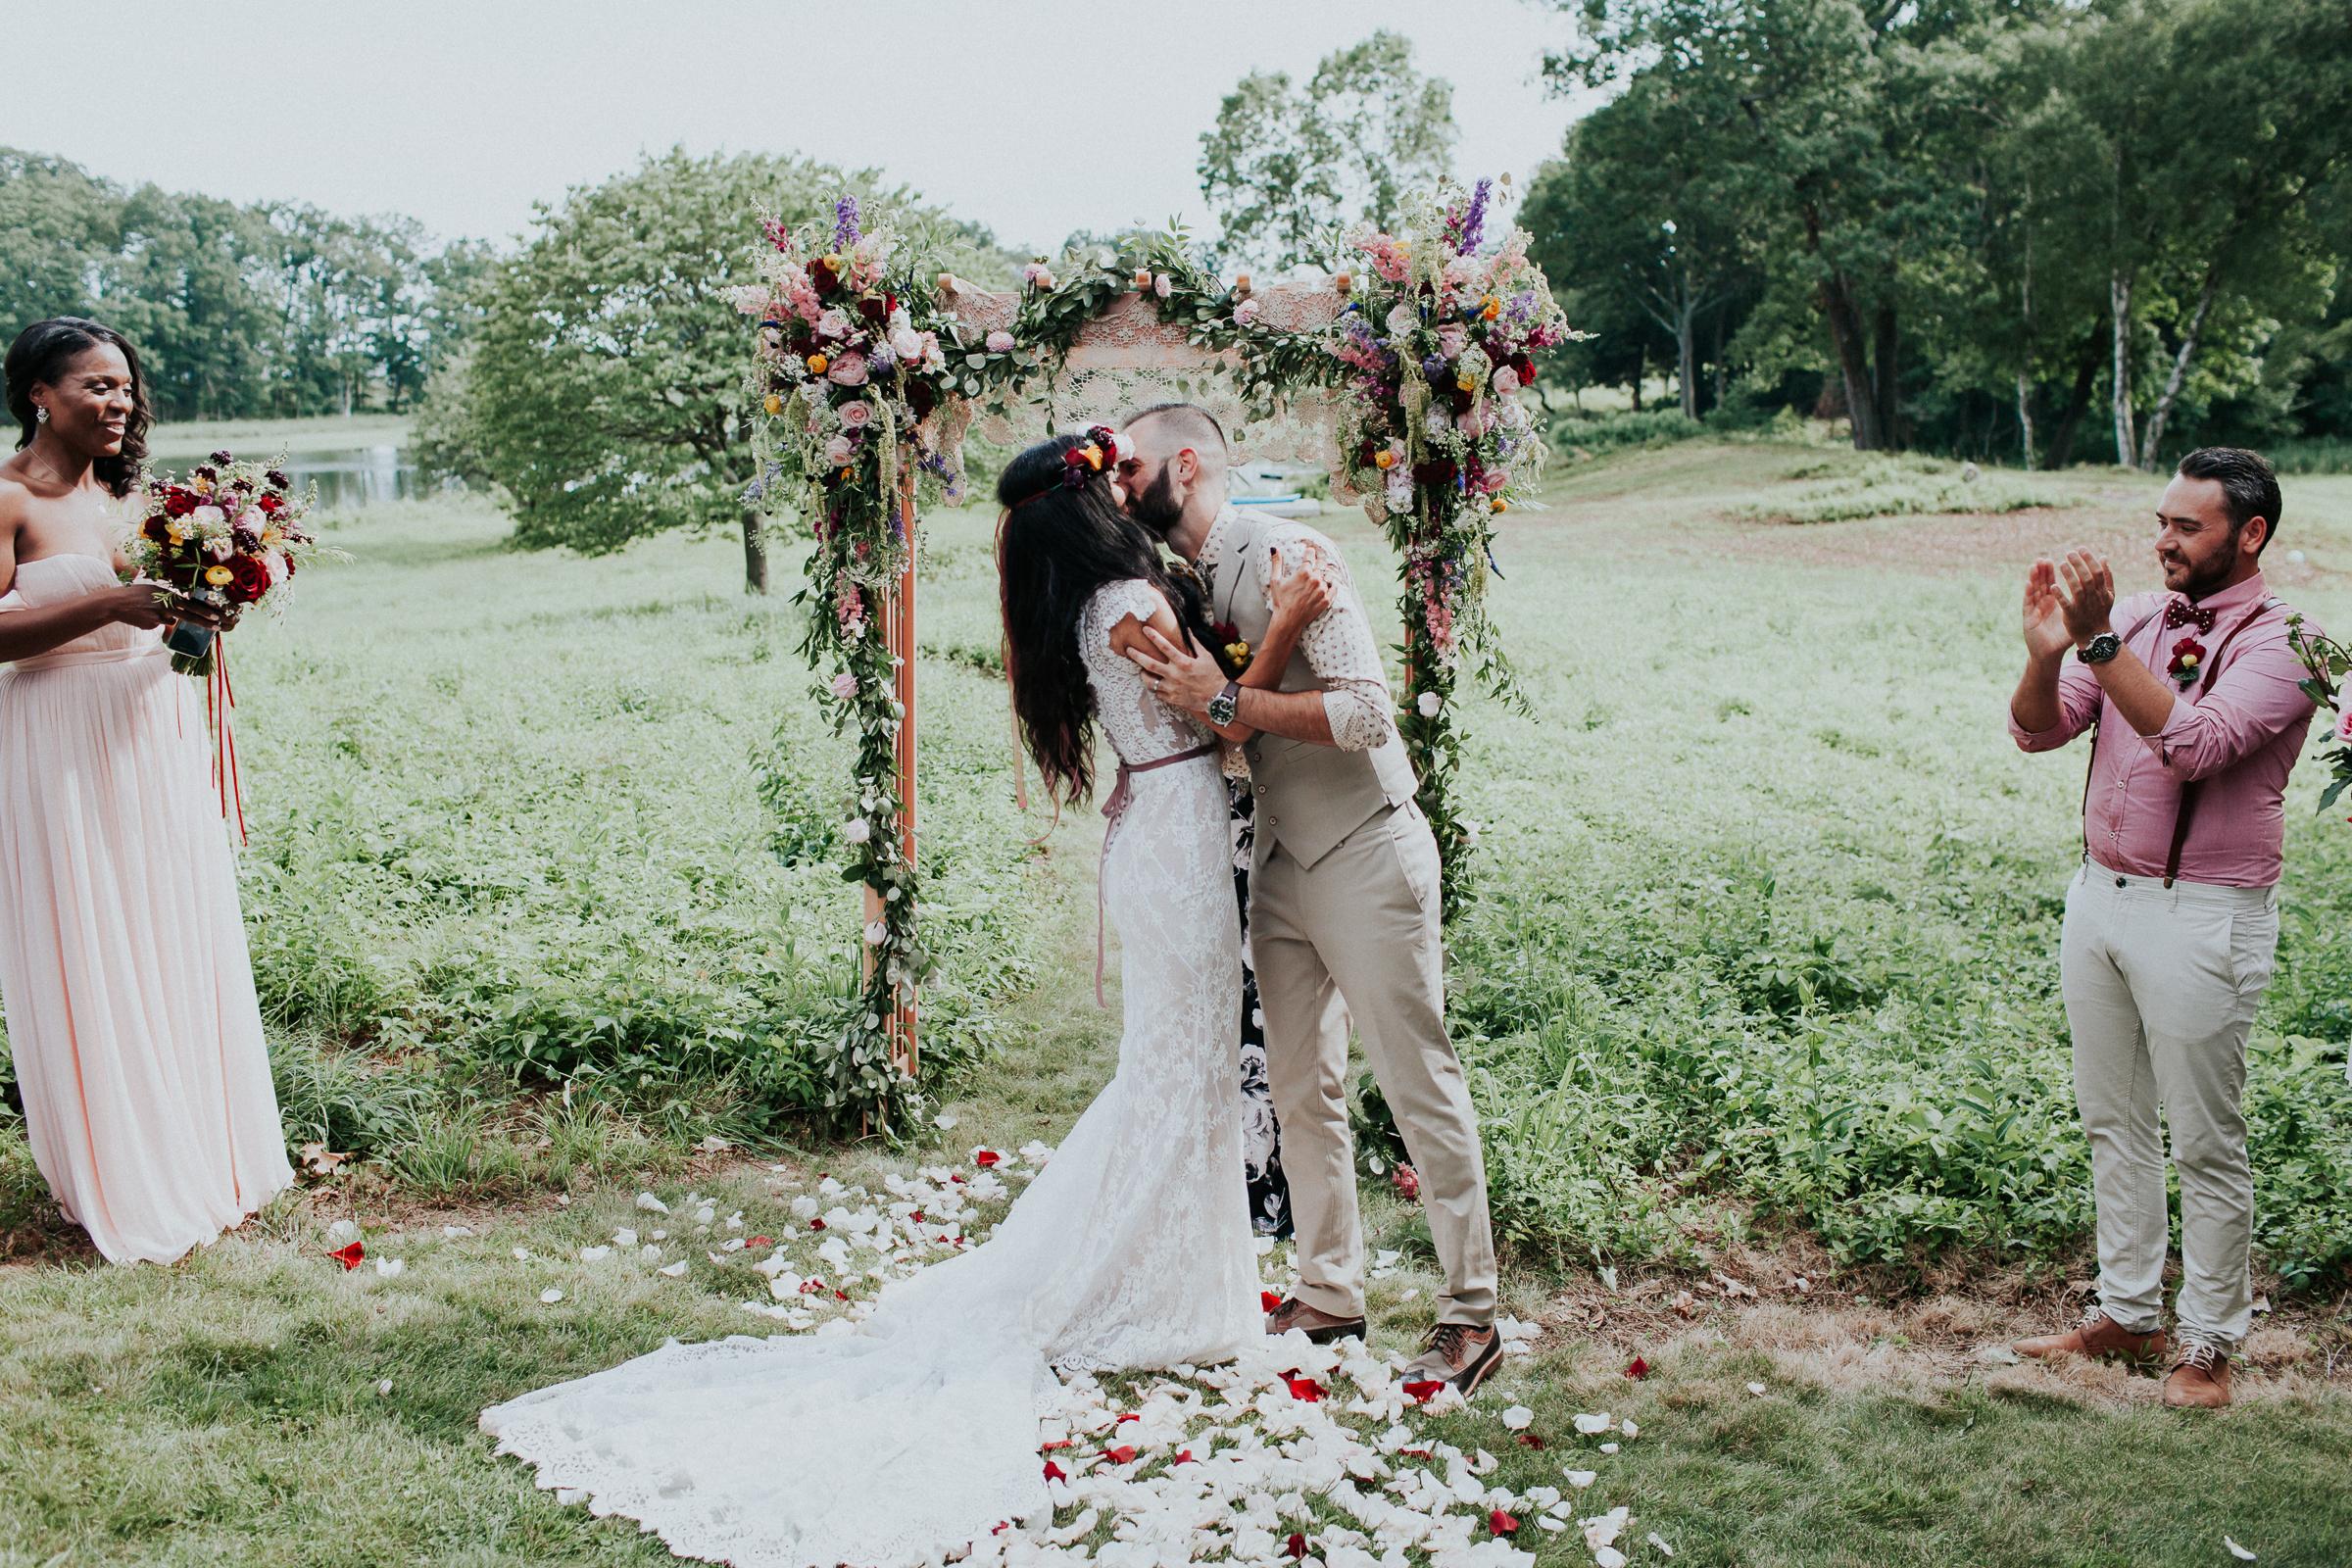 Backyard-Intimate-Adventurous-Destination-Wedding-Darien-Connecticut-Documentary-Wedding-Photography-60.jpg